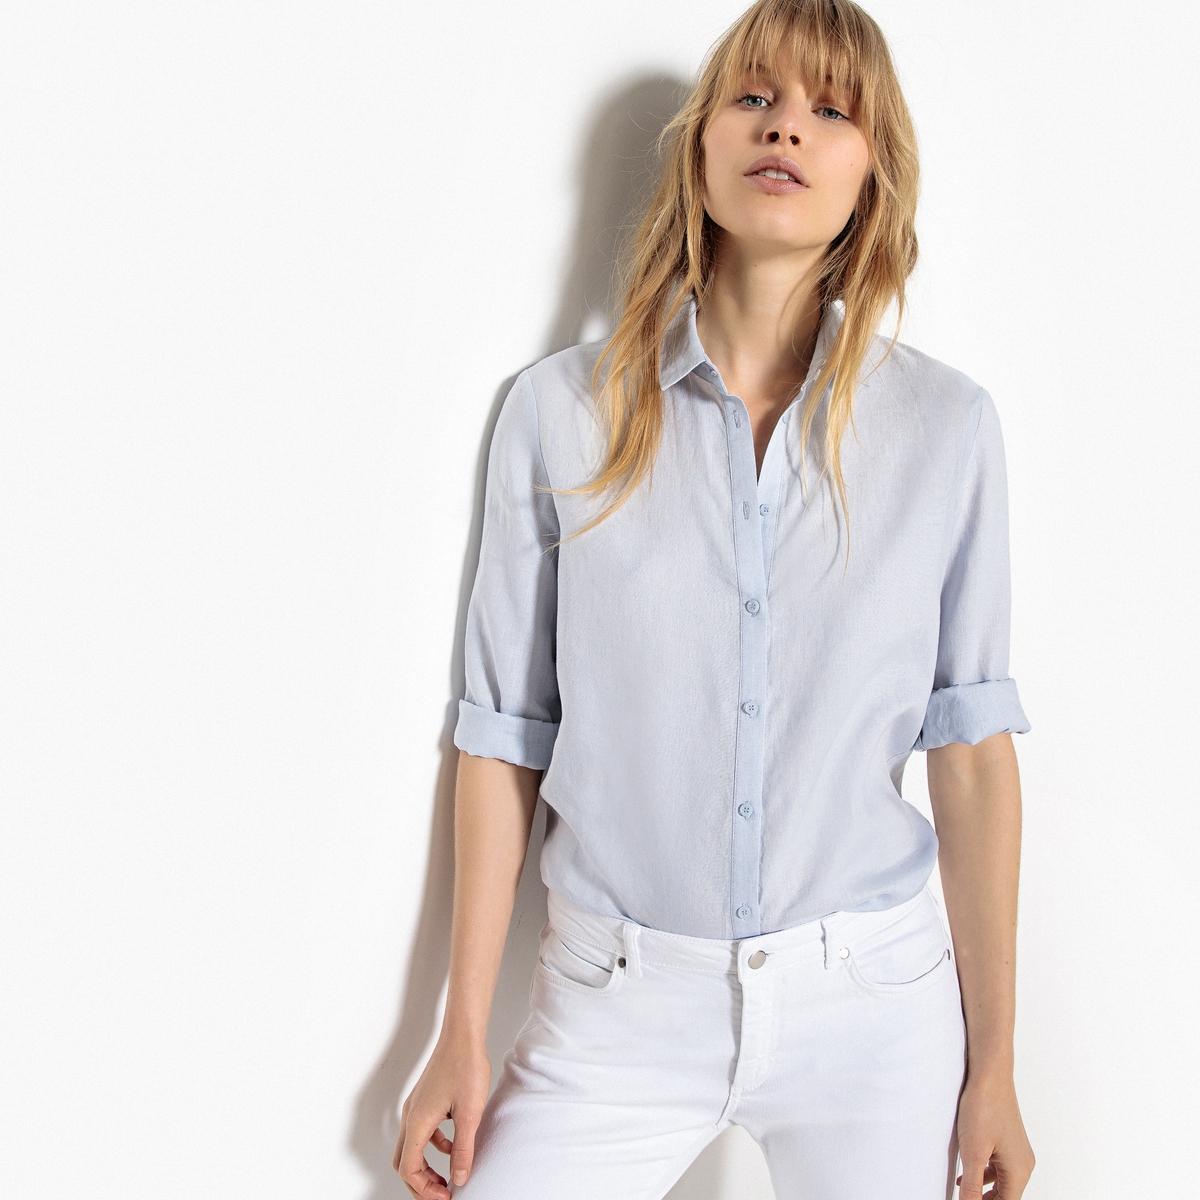 Camisa recta 100% lino